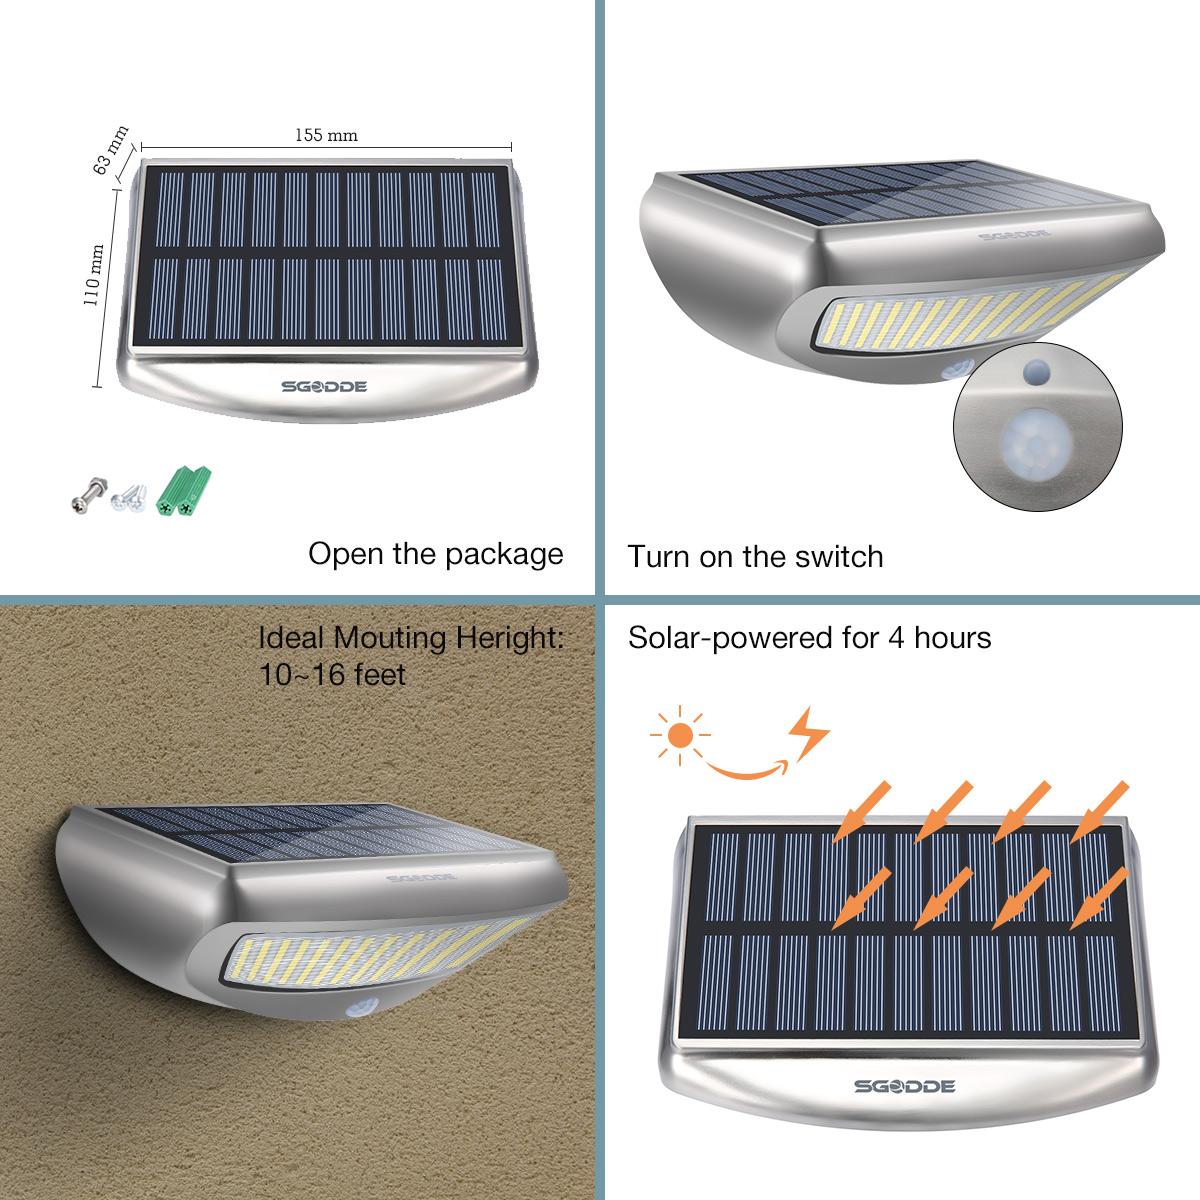 Solar lights outdoor motion sensor lights sgodde 36 led waterproof sgodde 36 led solar security light easy to use mozeypictures Gallery